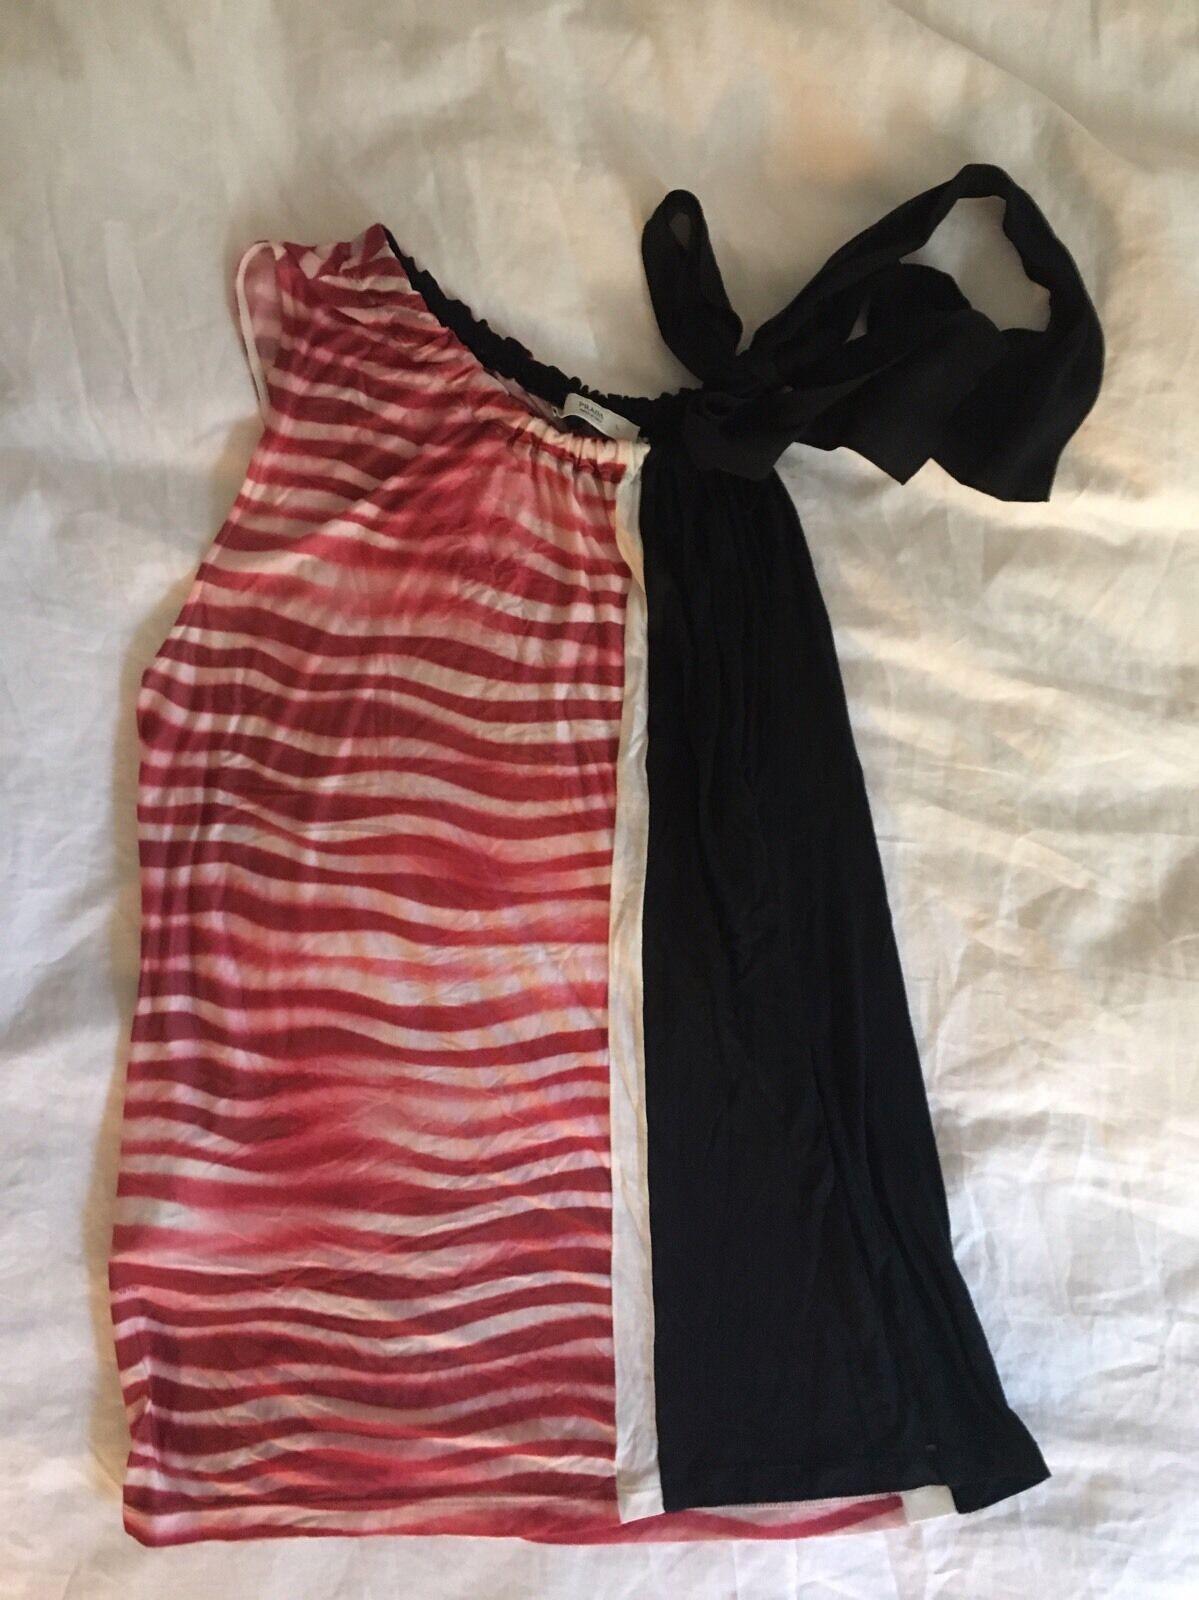 Prada ROT & Weiß Sleeveless Modal & Silk Blouse w/ Bow at Shoulder Sz L EUC